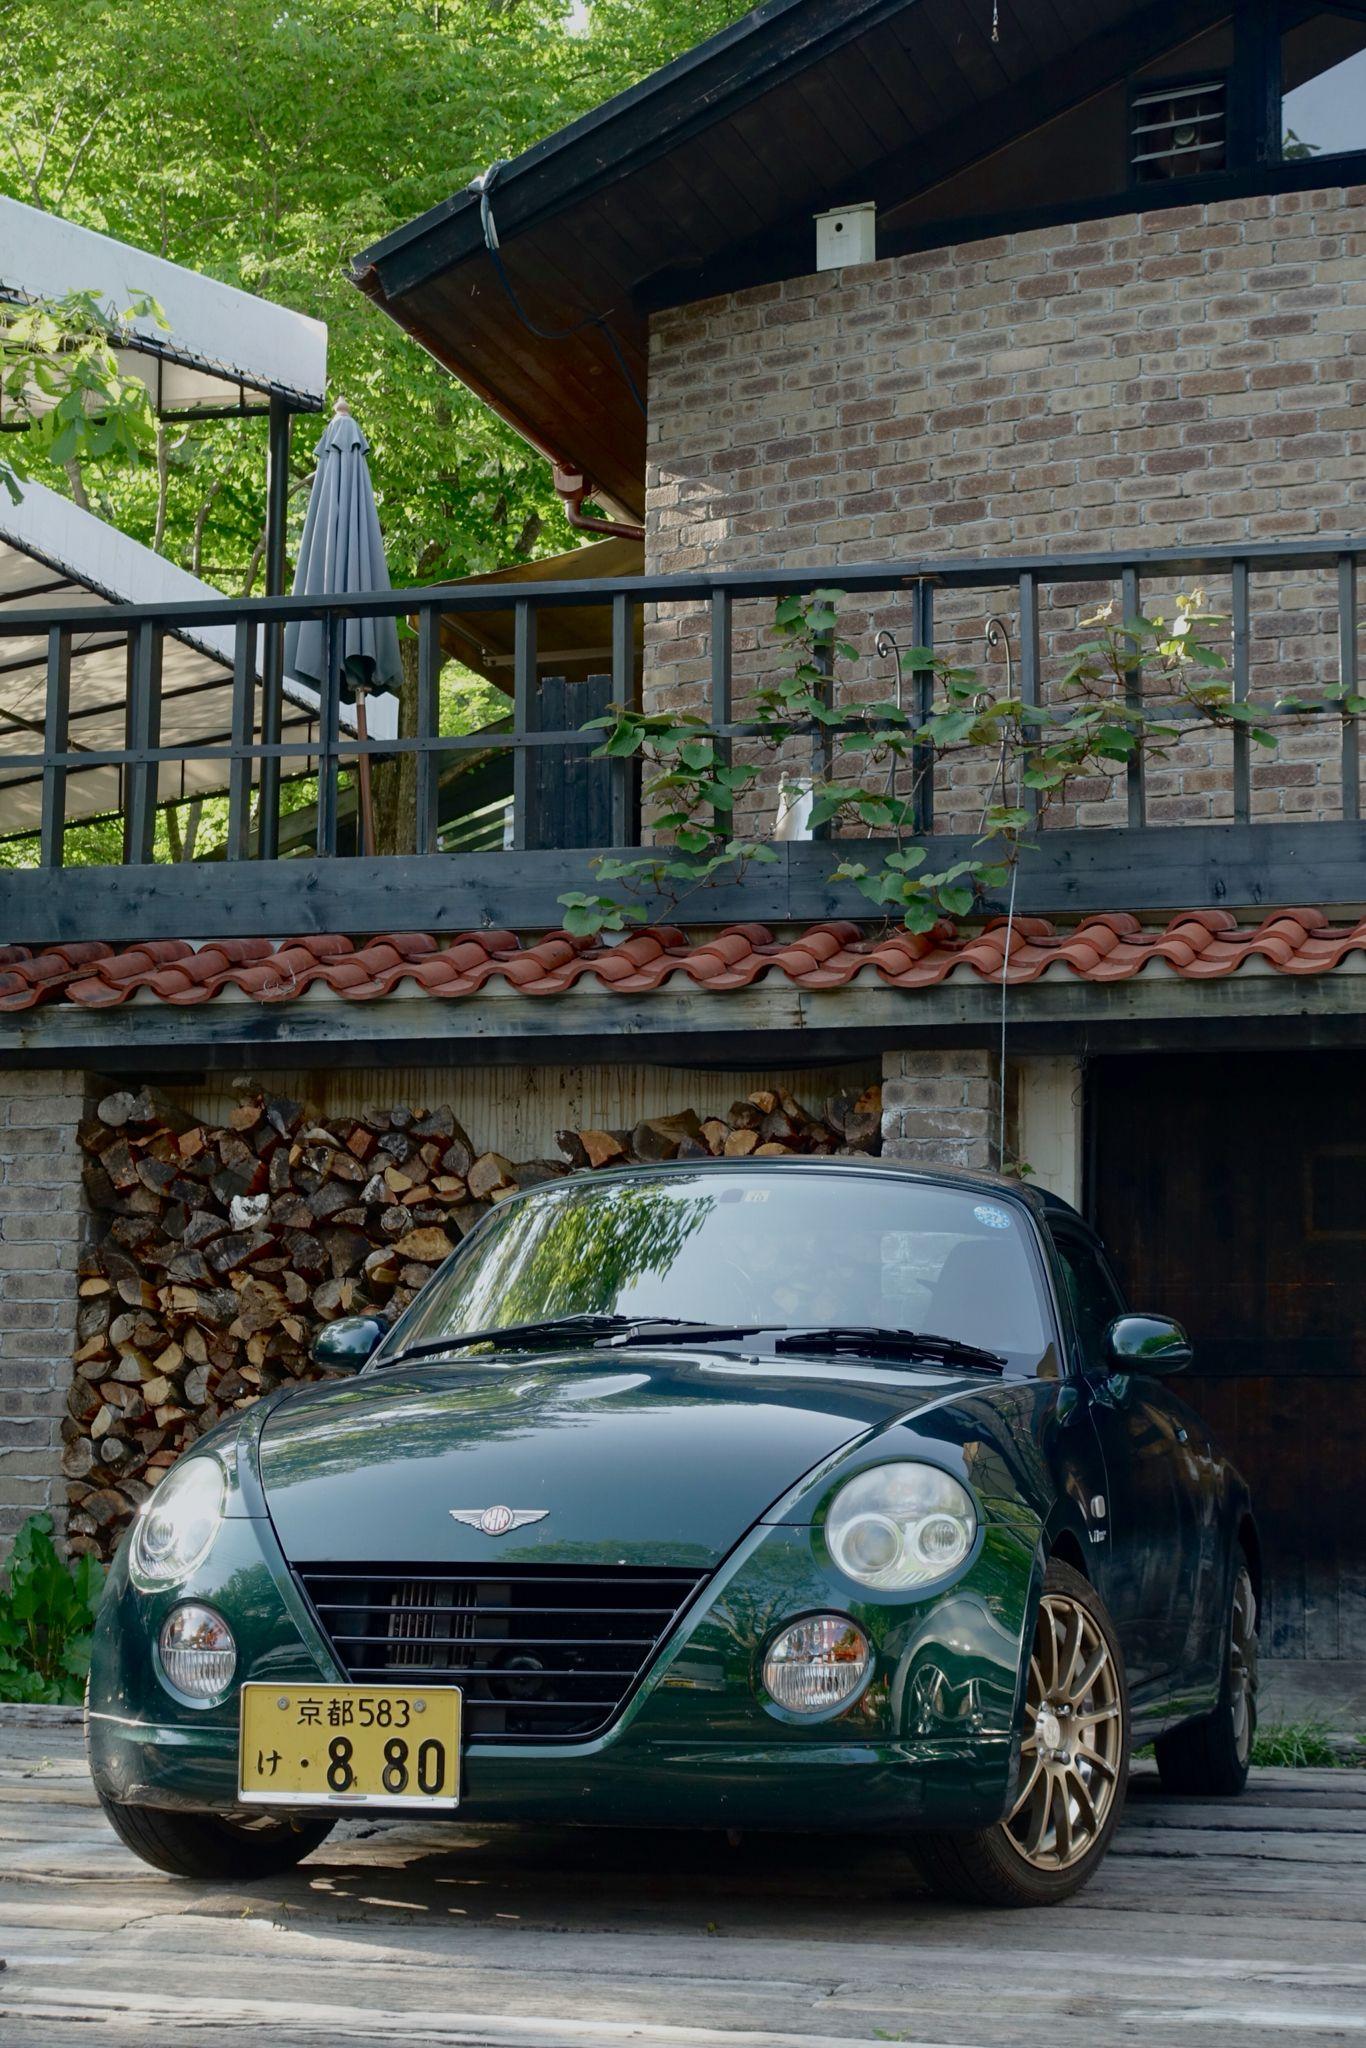 Daihatsu Copen 八ヶ岳 Amazing Old Cars Pinterest Daihatsu